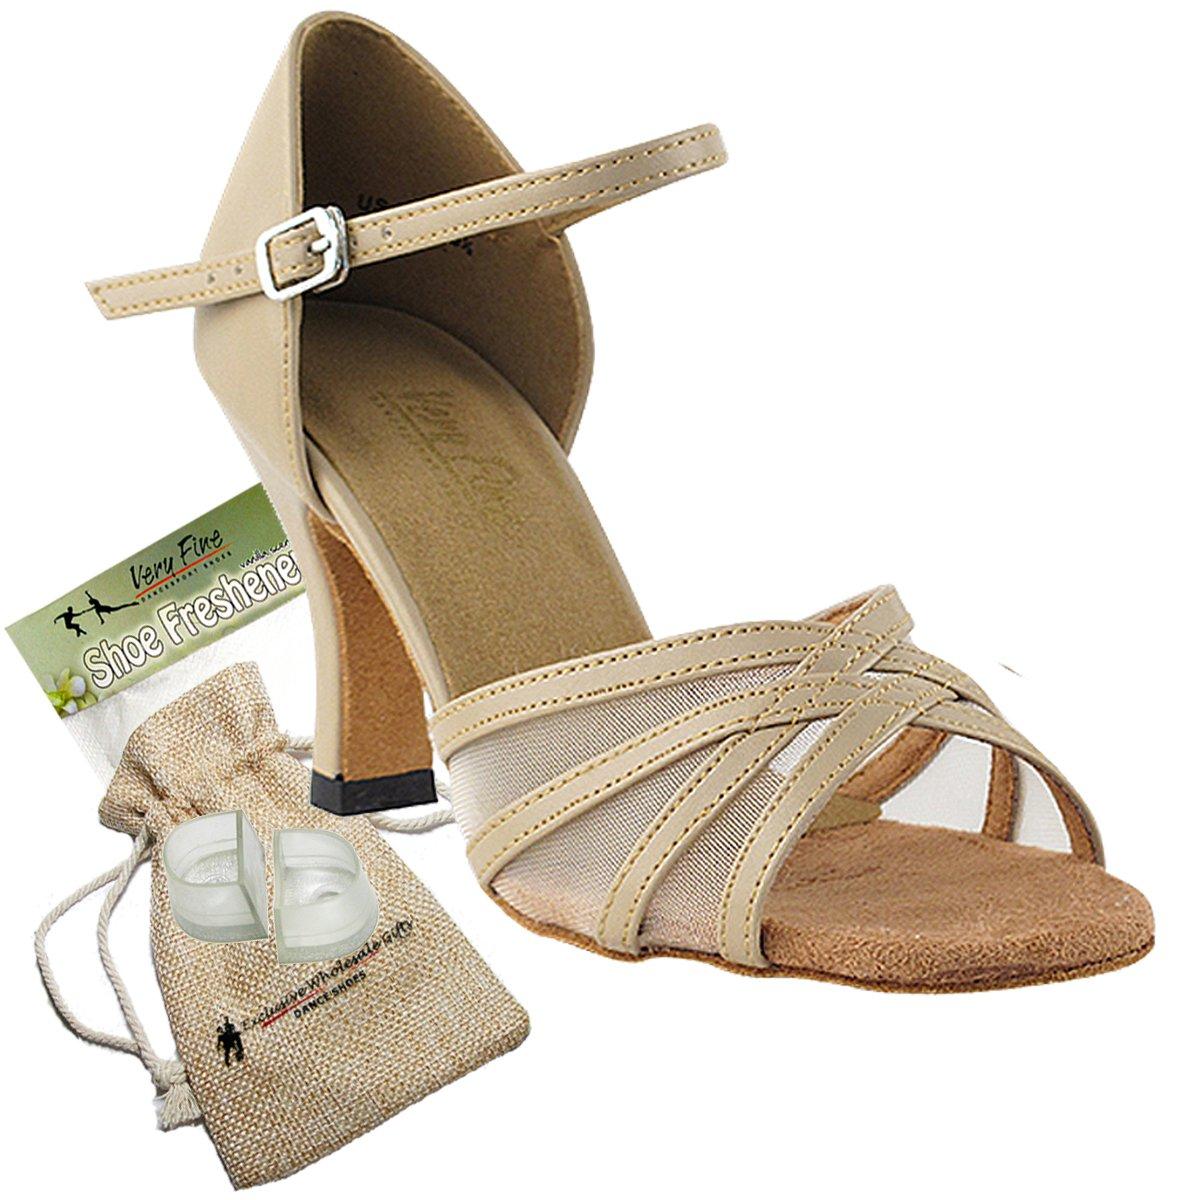 Women's Ballroom Dance Shoes Tango Wedding Salsa Dance Shoes Tan Leather & Flesh Mesh 6027EB Comfortable - Very Fine 2.5'' Heel 8 M US [Bundle of 5]